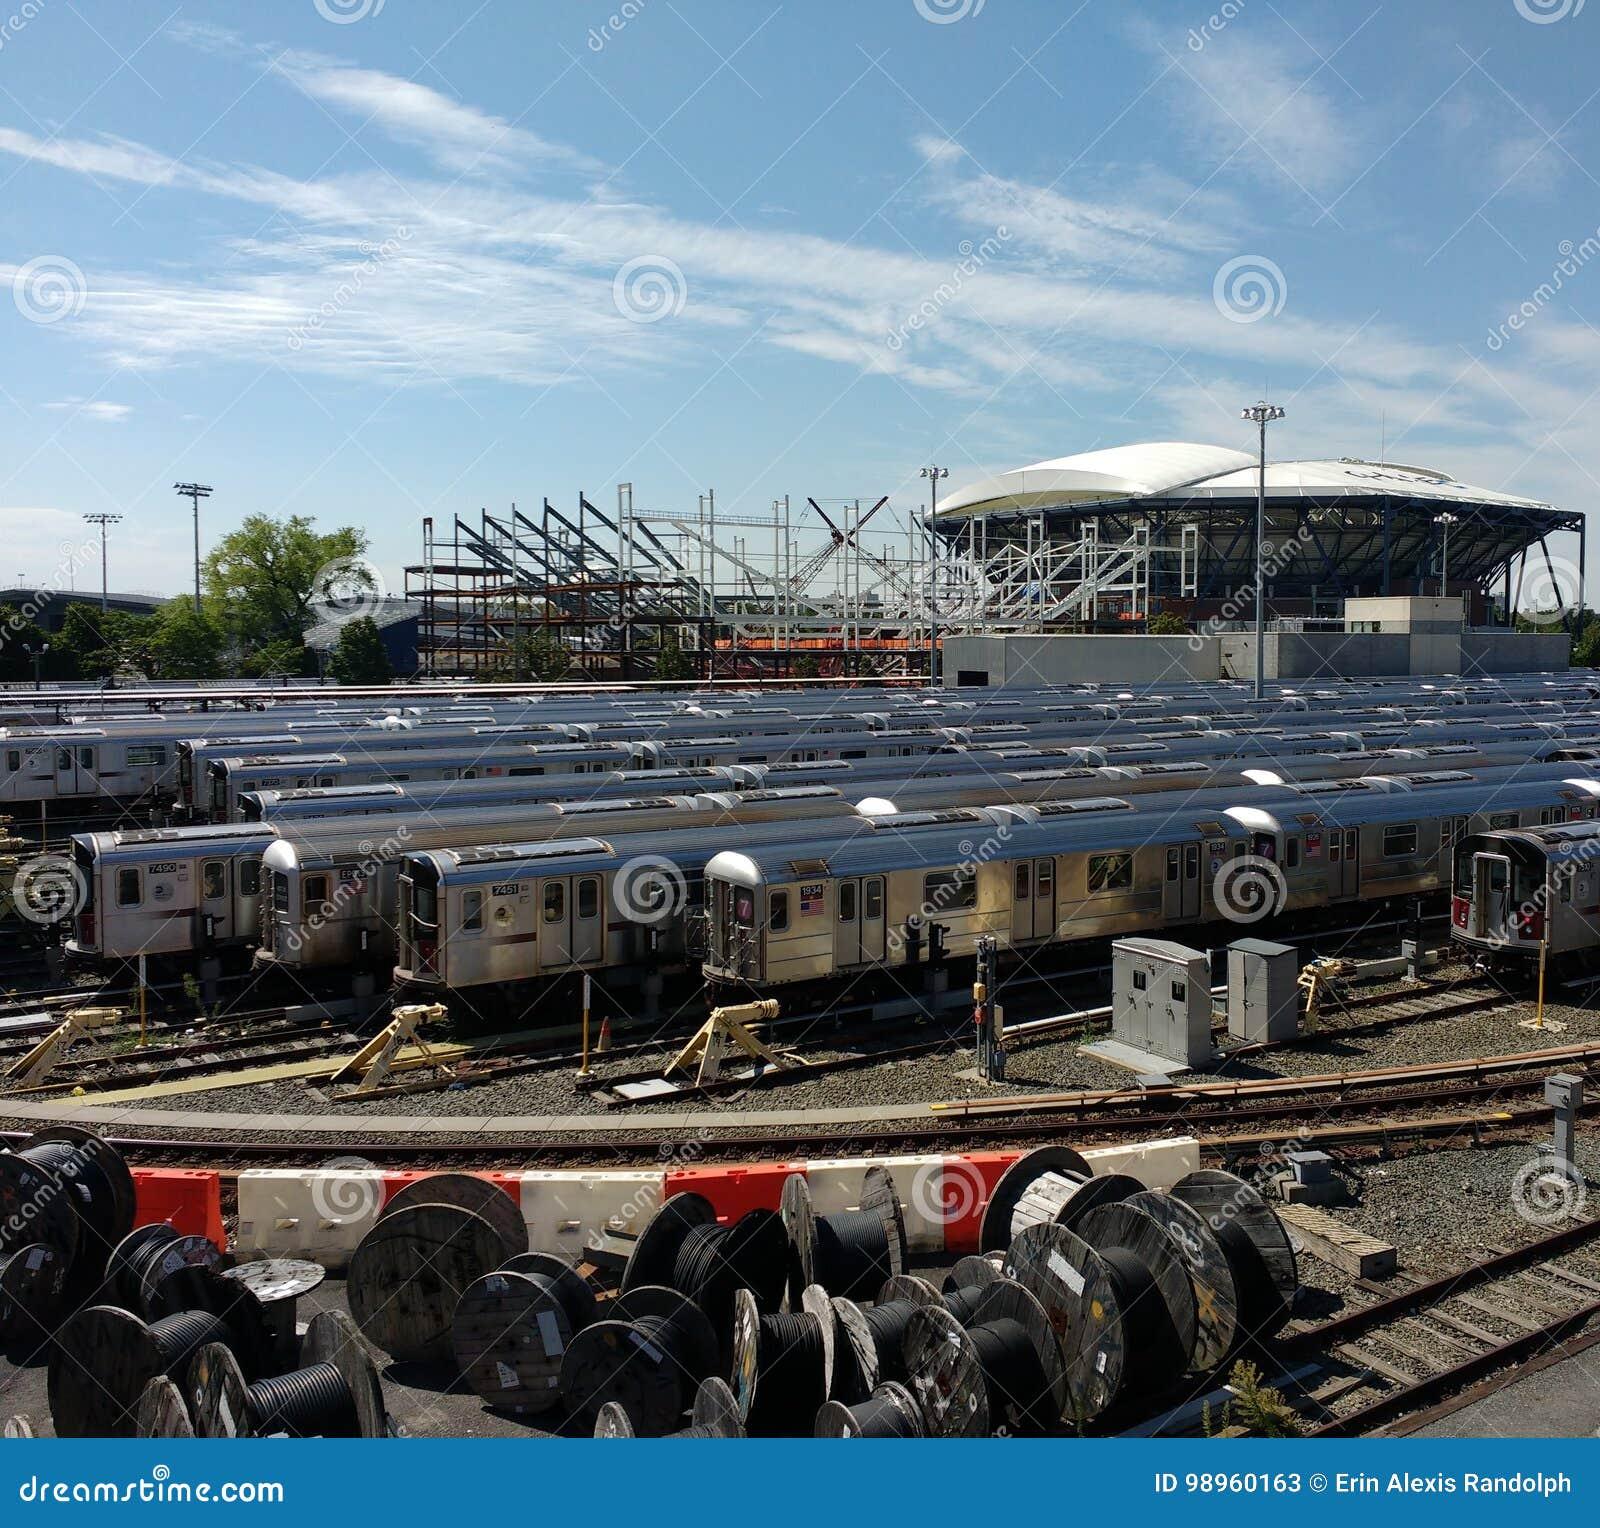 Tennis, Louis Armstrong Stadium Under Construction de côté Arthur Ashe Stadium de Corona Rail Yard, NYC, NY, Etats-Unis